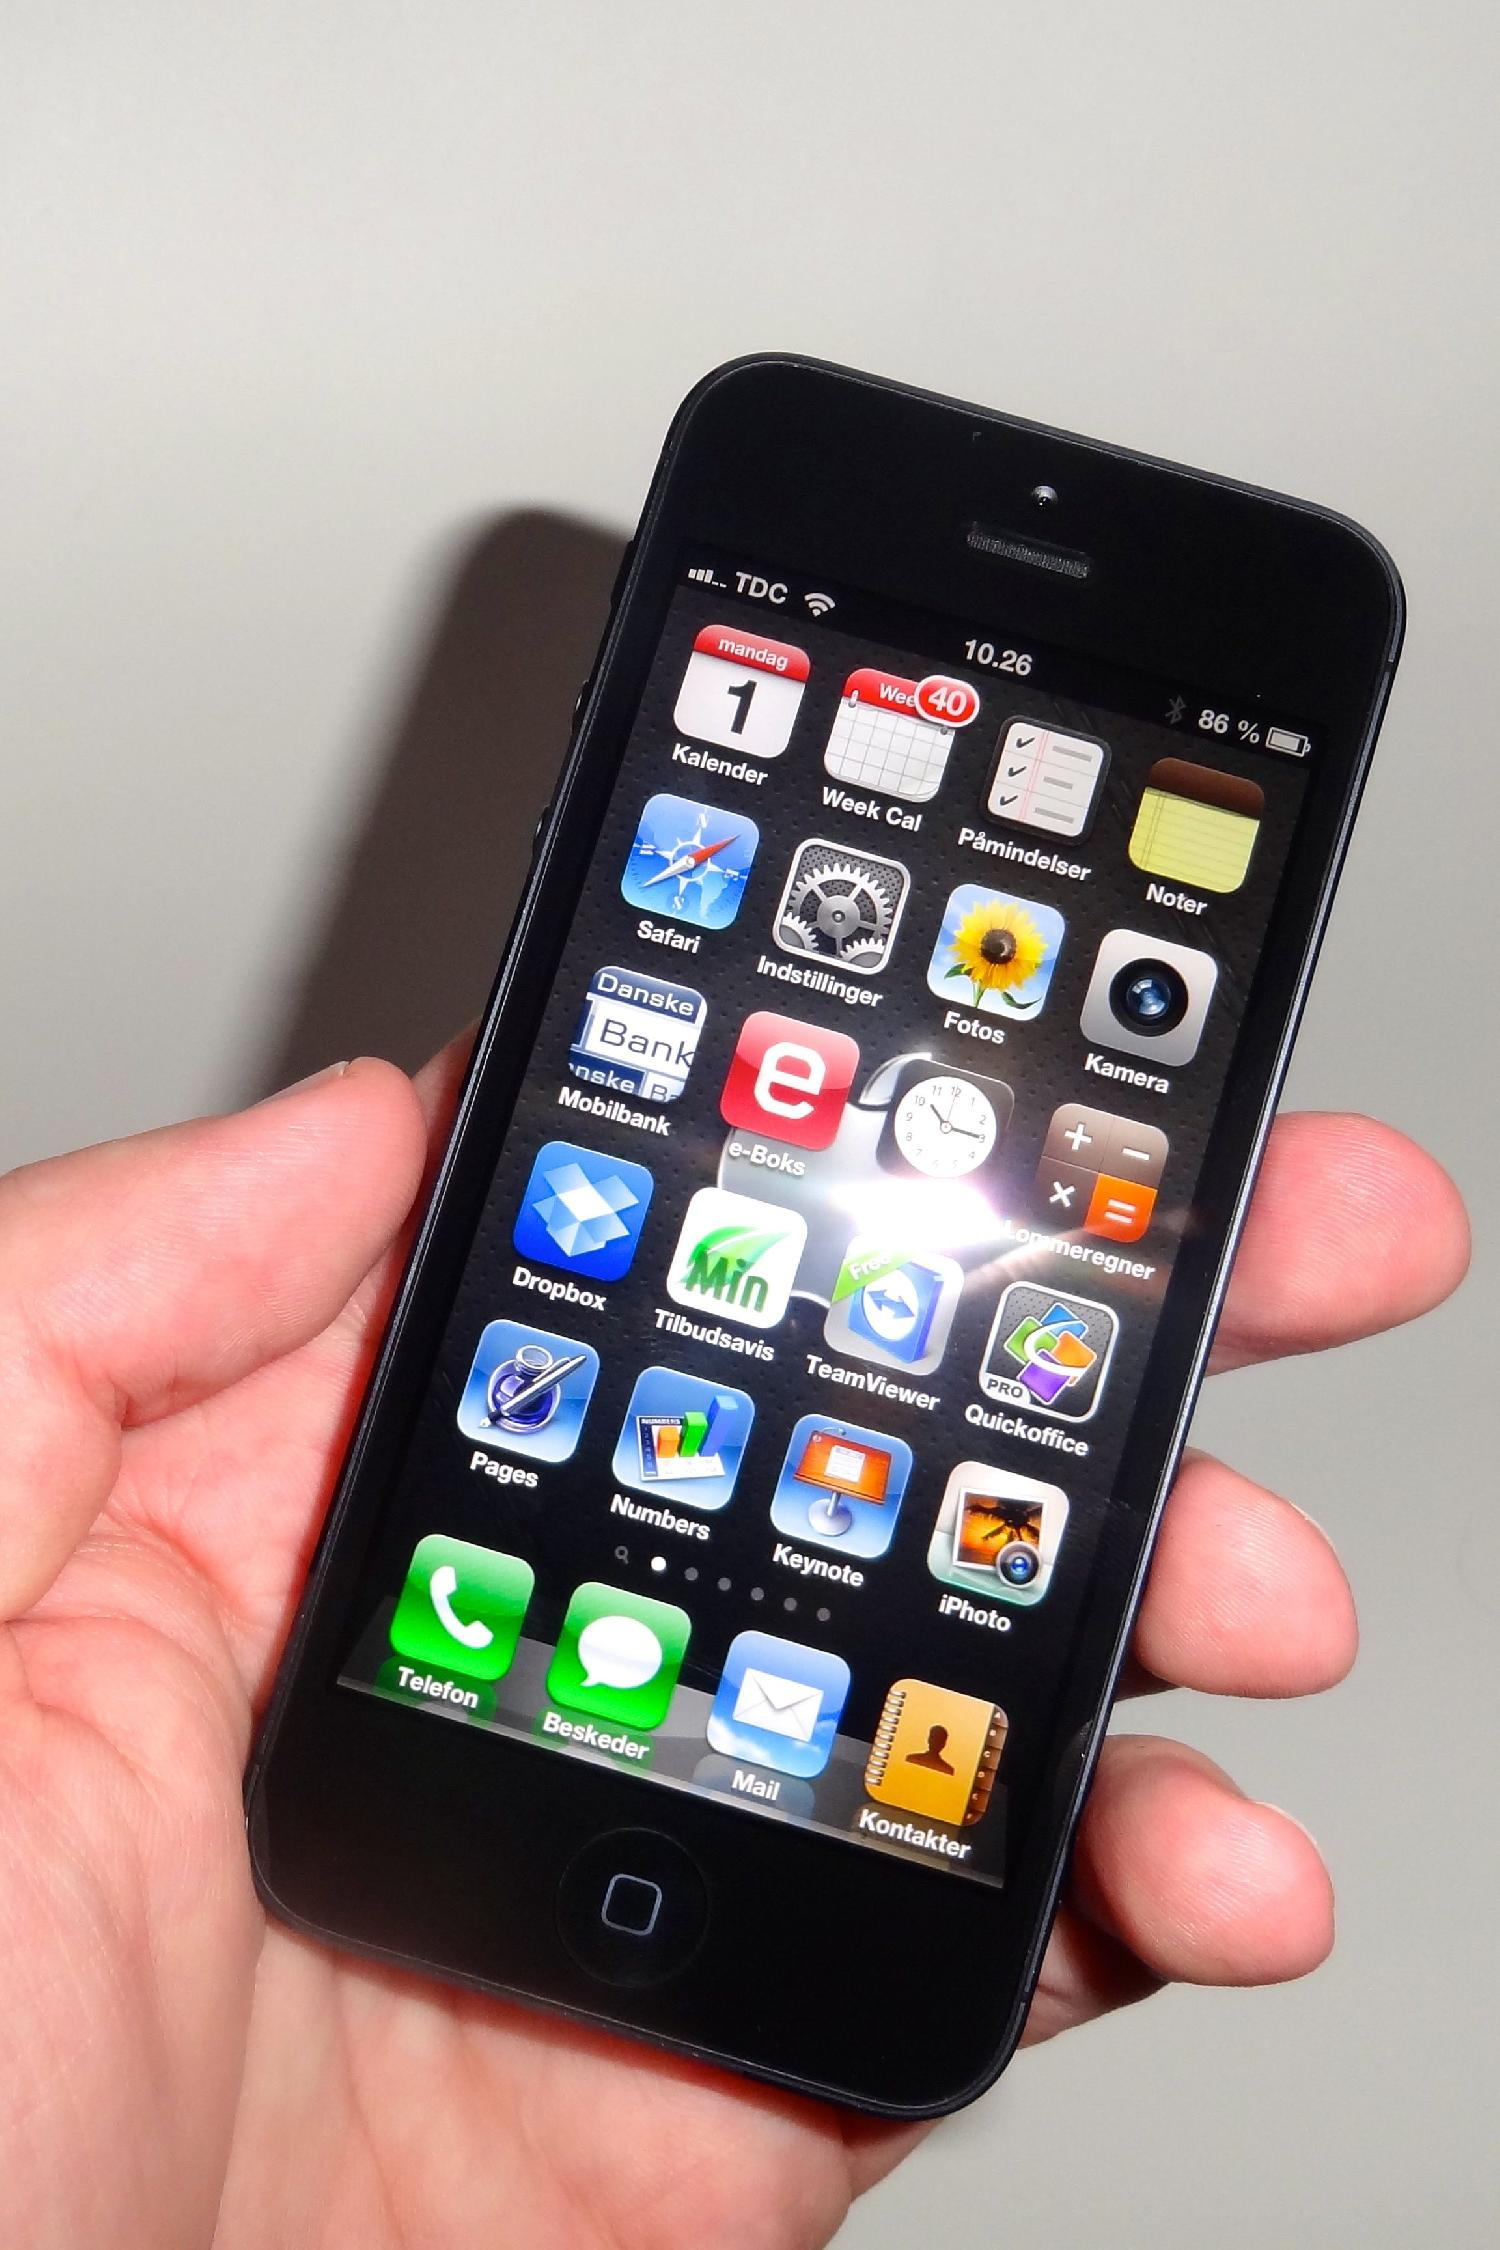 iPhone 5 i hånden